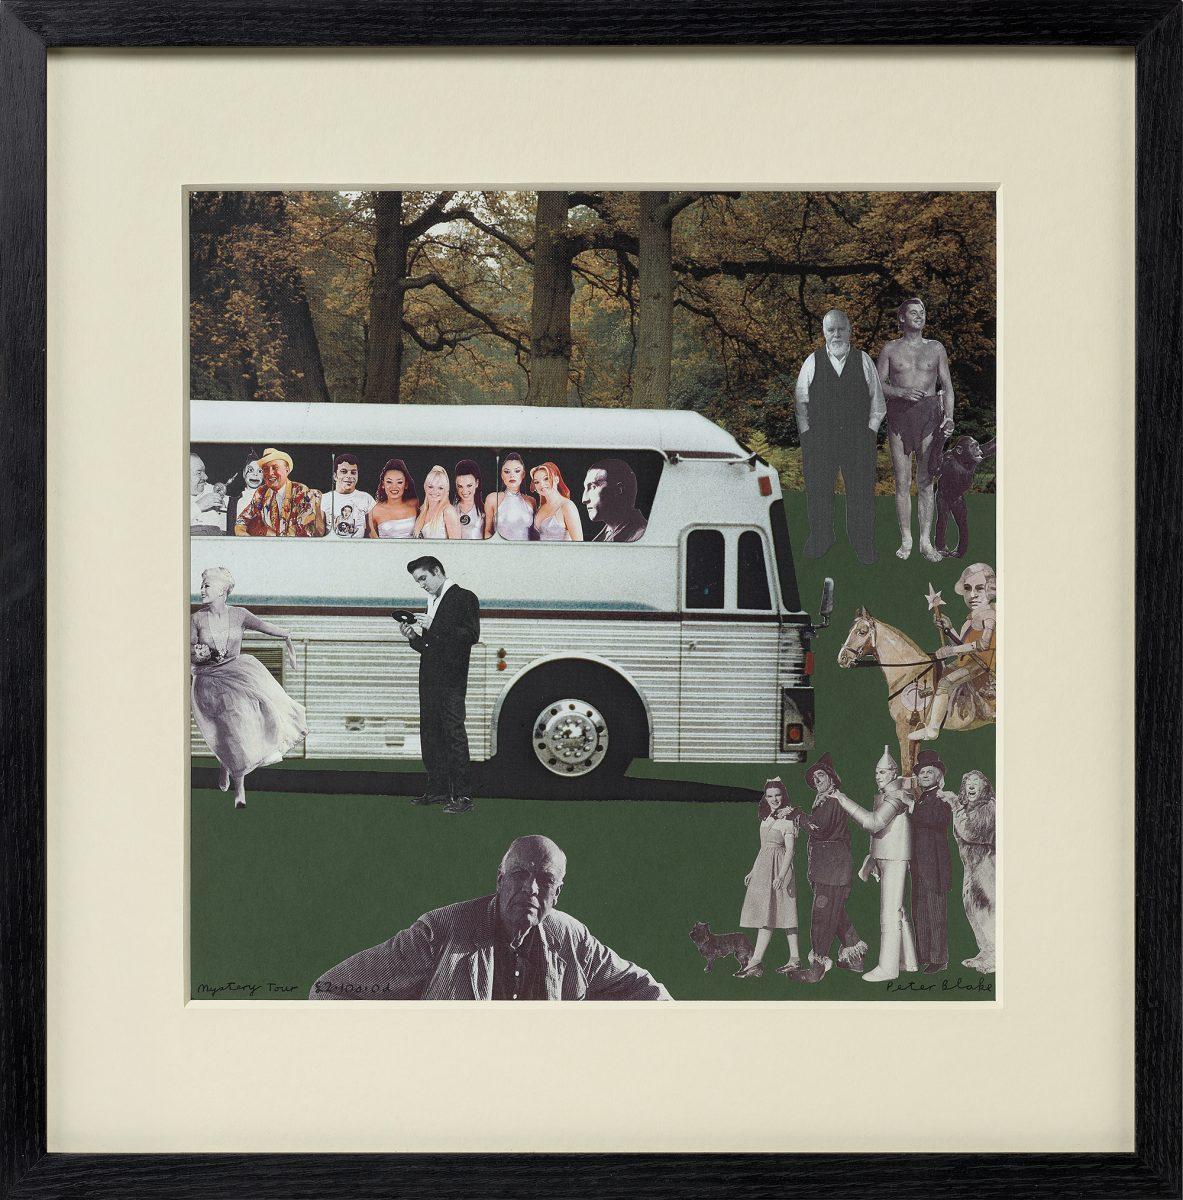 Mystery Tour £2. 10s. 0d, 2005